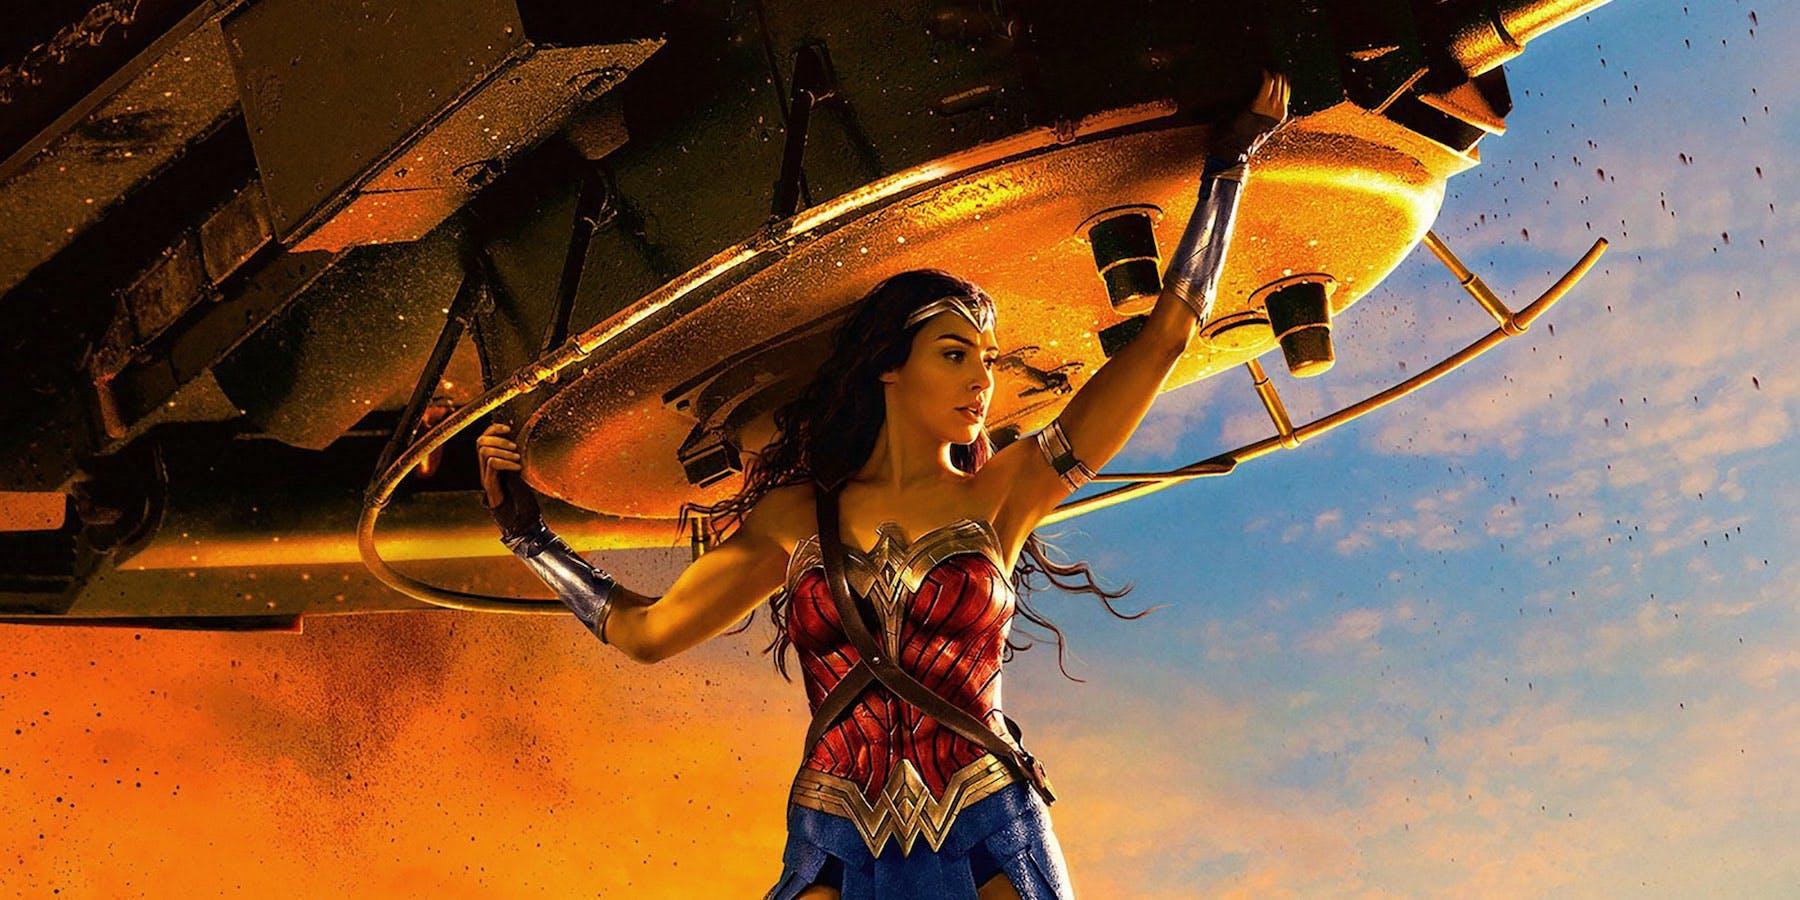 Wonder-Woman-Tank-Poster-Cropped.jpg